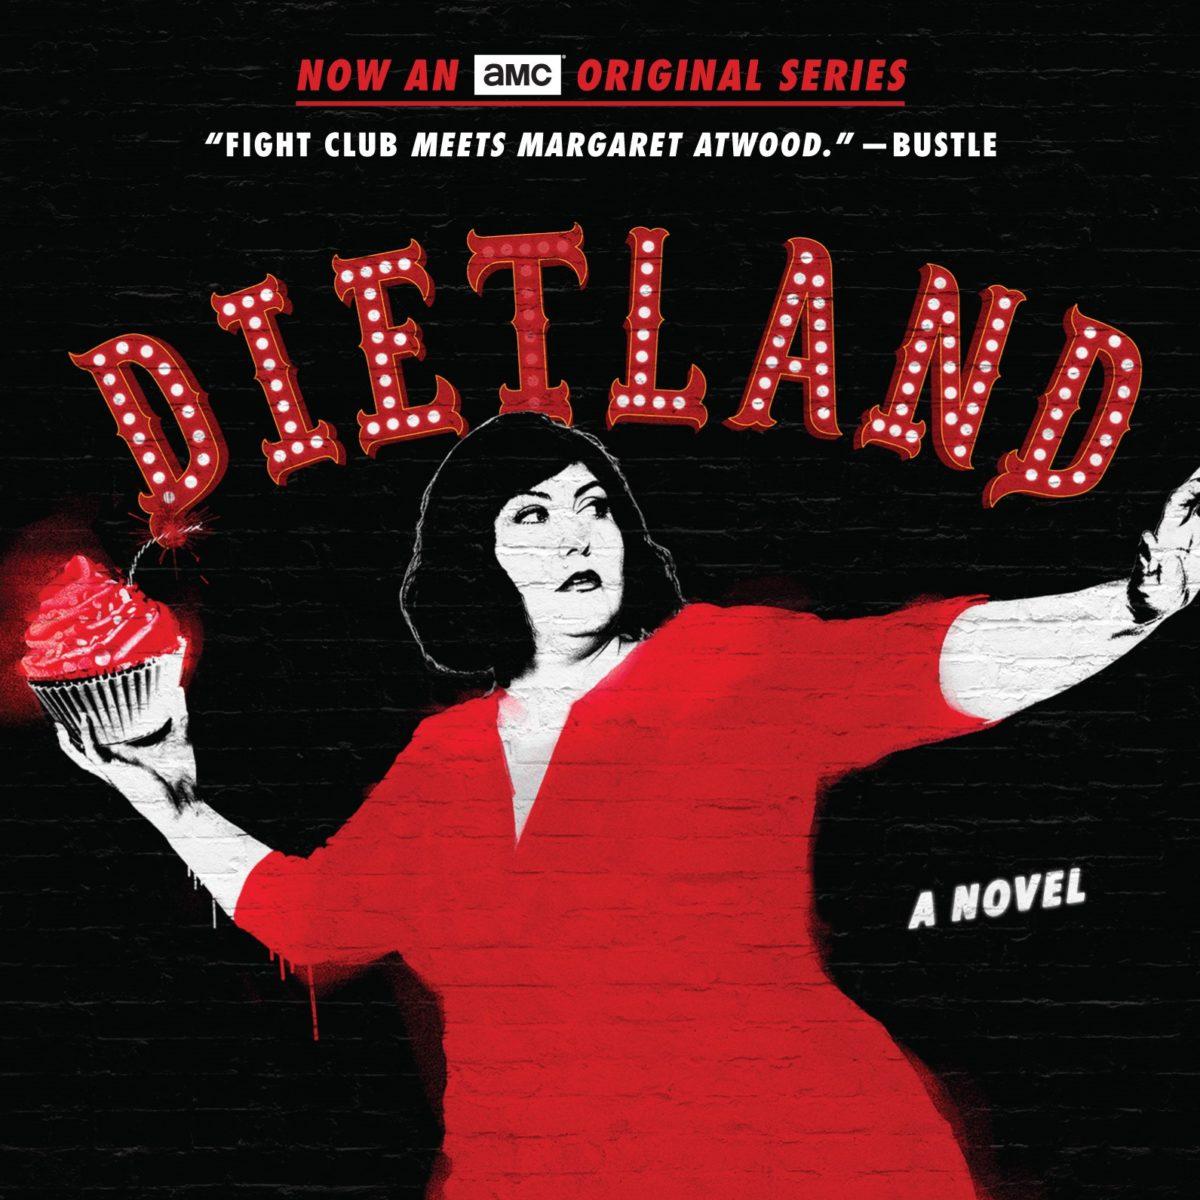 plakat reklamowy serialu Dietoland